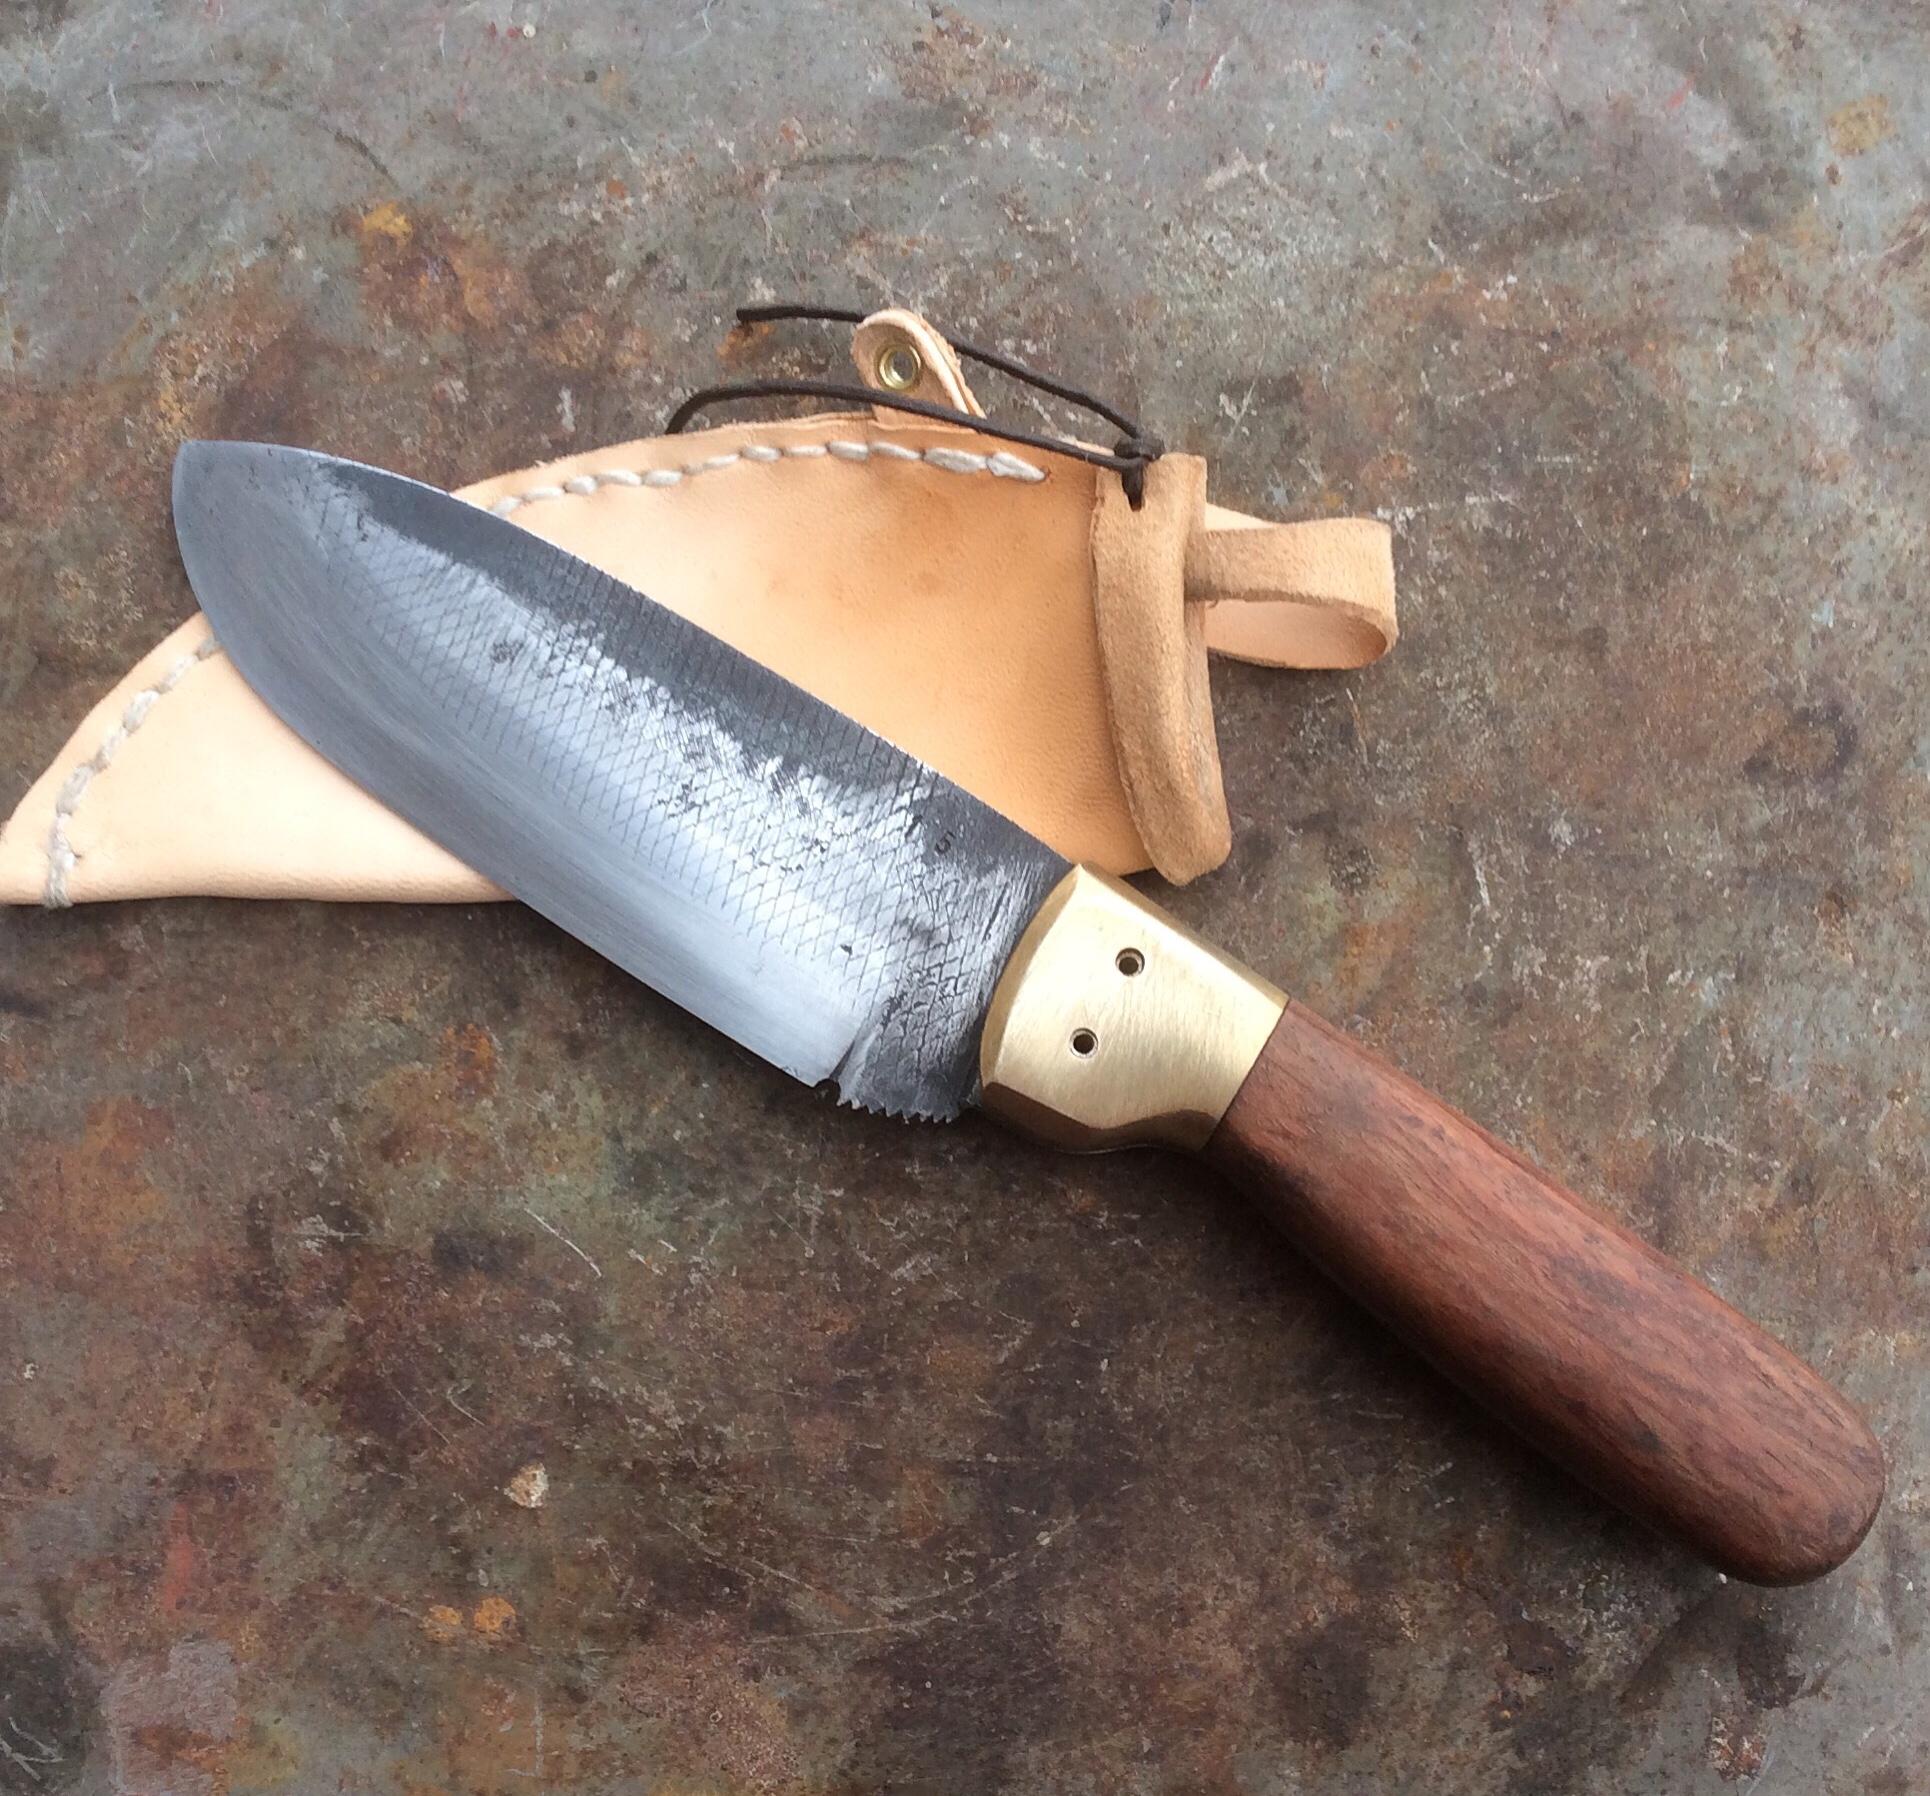 Handgesmeed mes van een oude rasp.